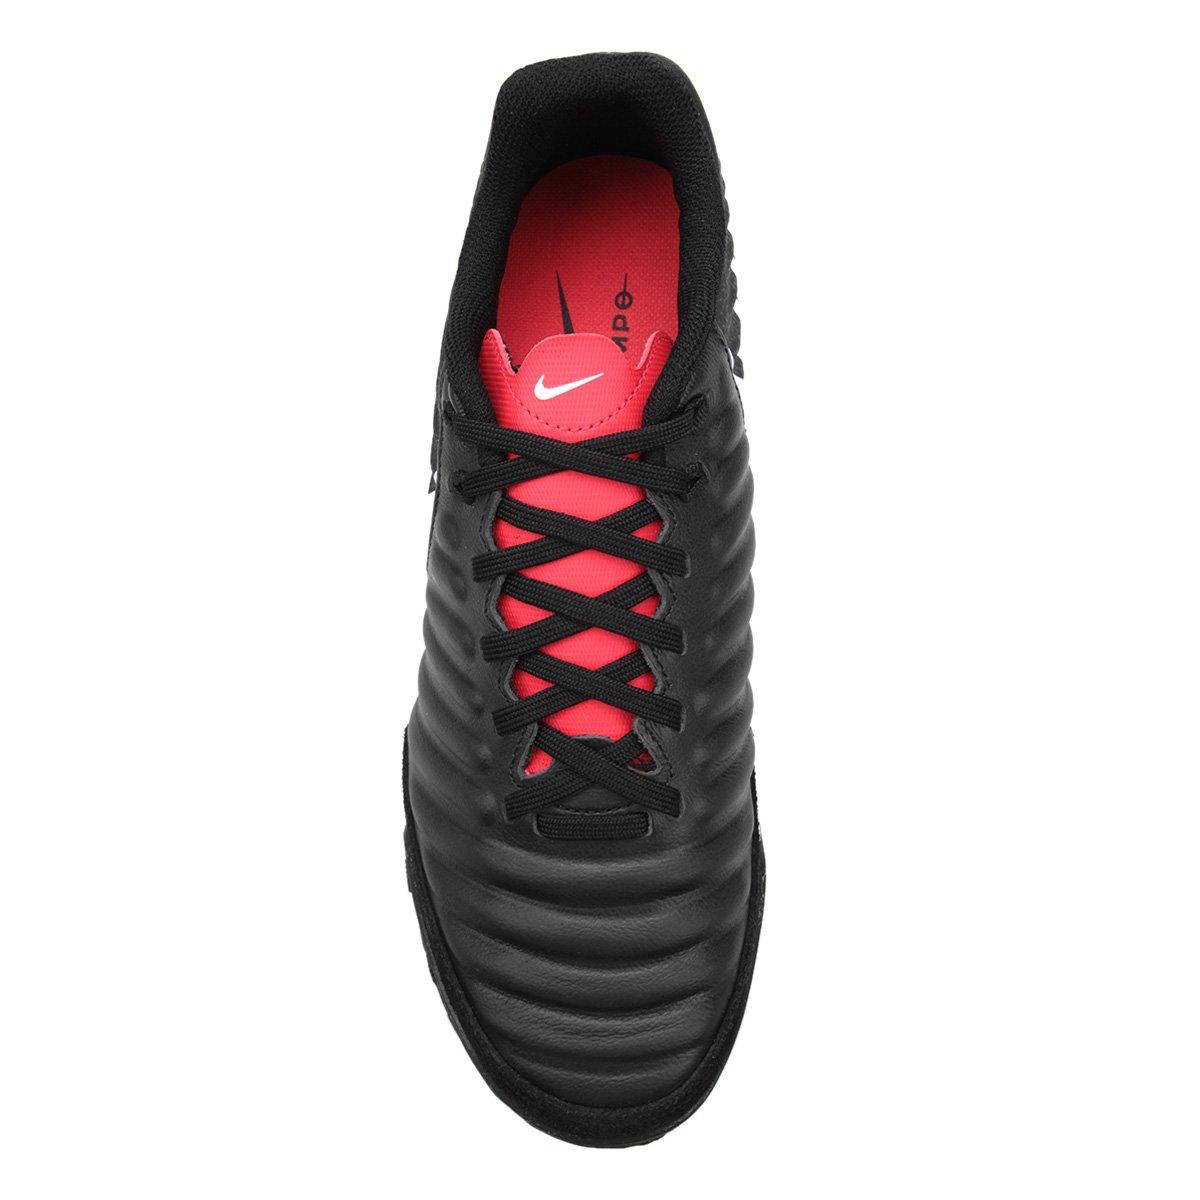 5951934fa9 Chuteira Futsal Nike Tiempo Legend 7 Academy IC - Preto e Cinza ...